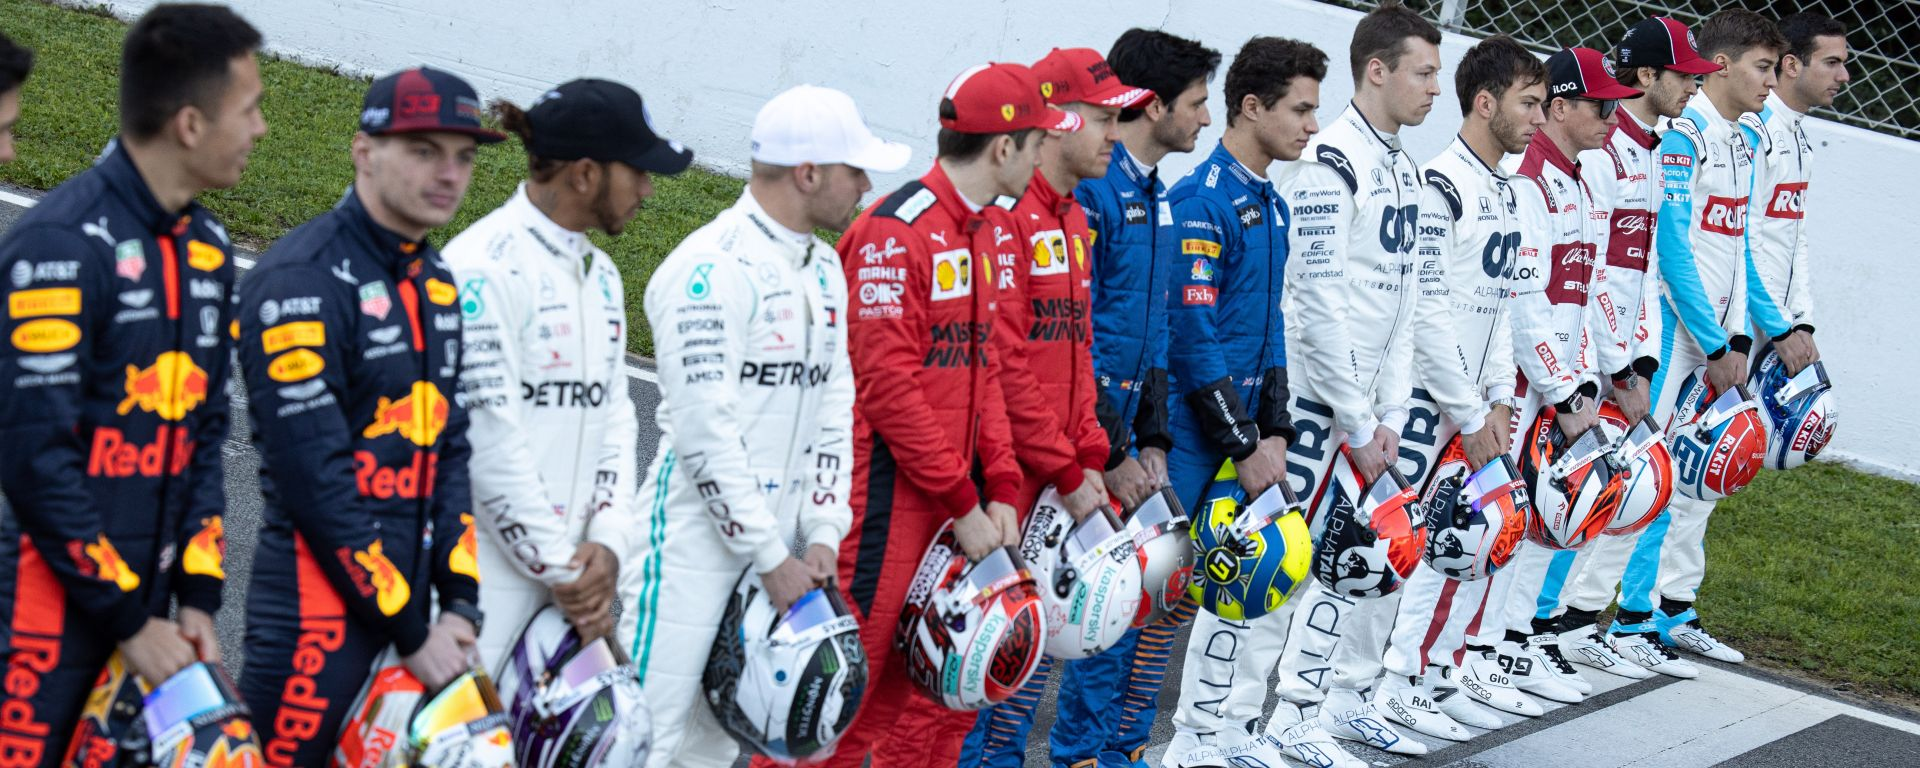 Coronavirus e motorsport: quale futuro? RadioBox #15 con Stefano Mancini